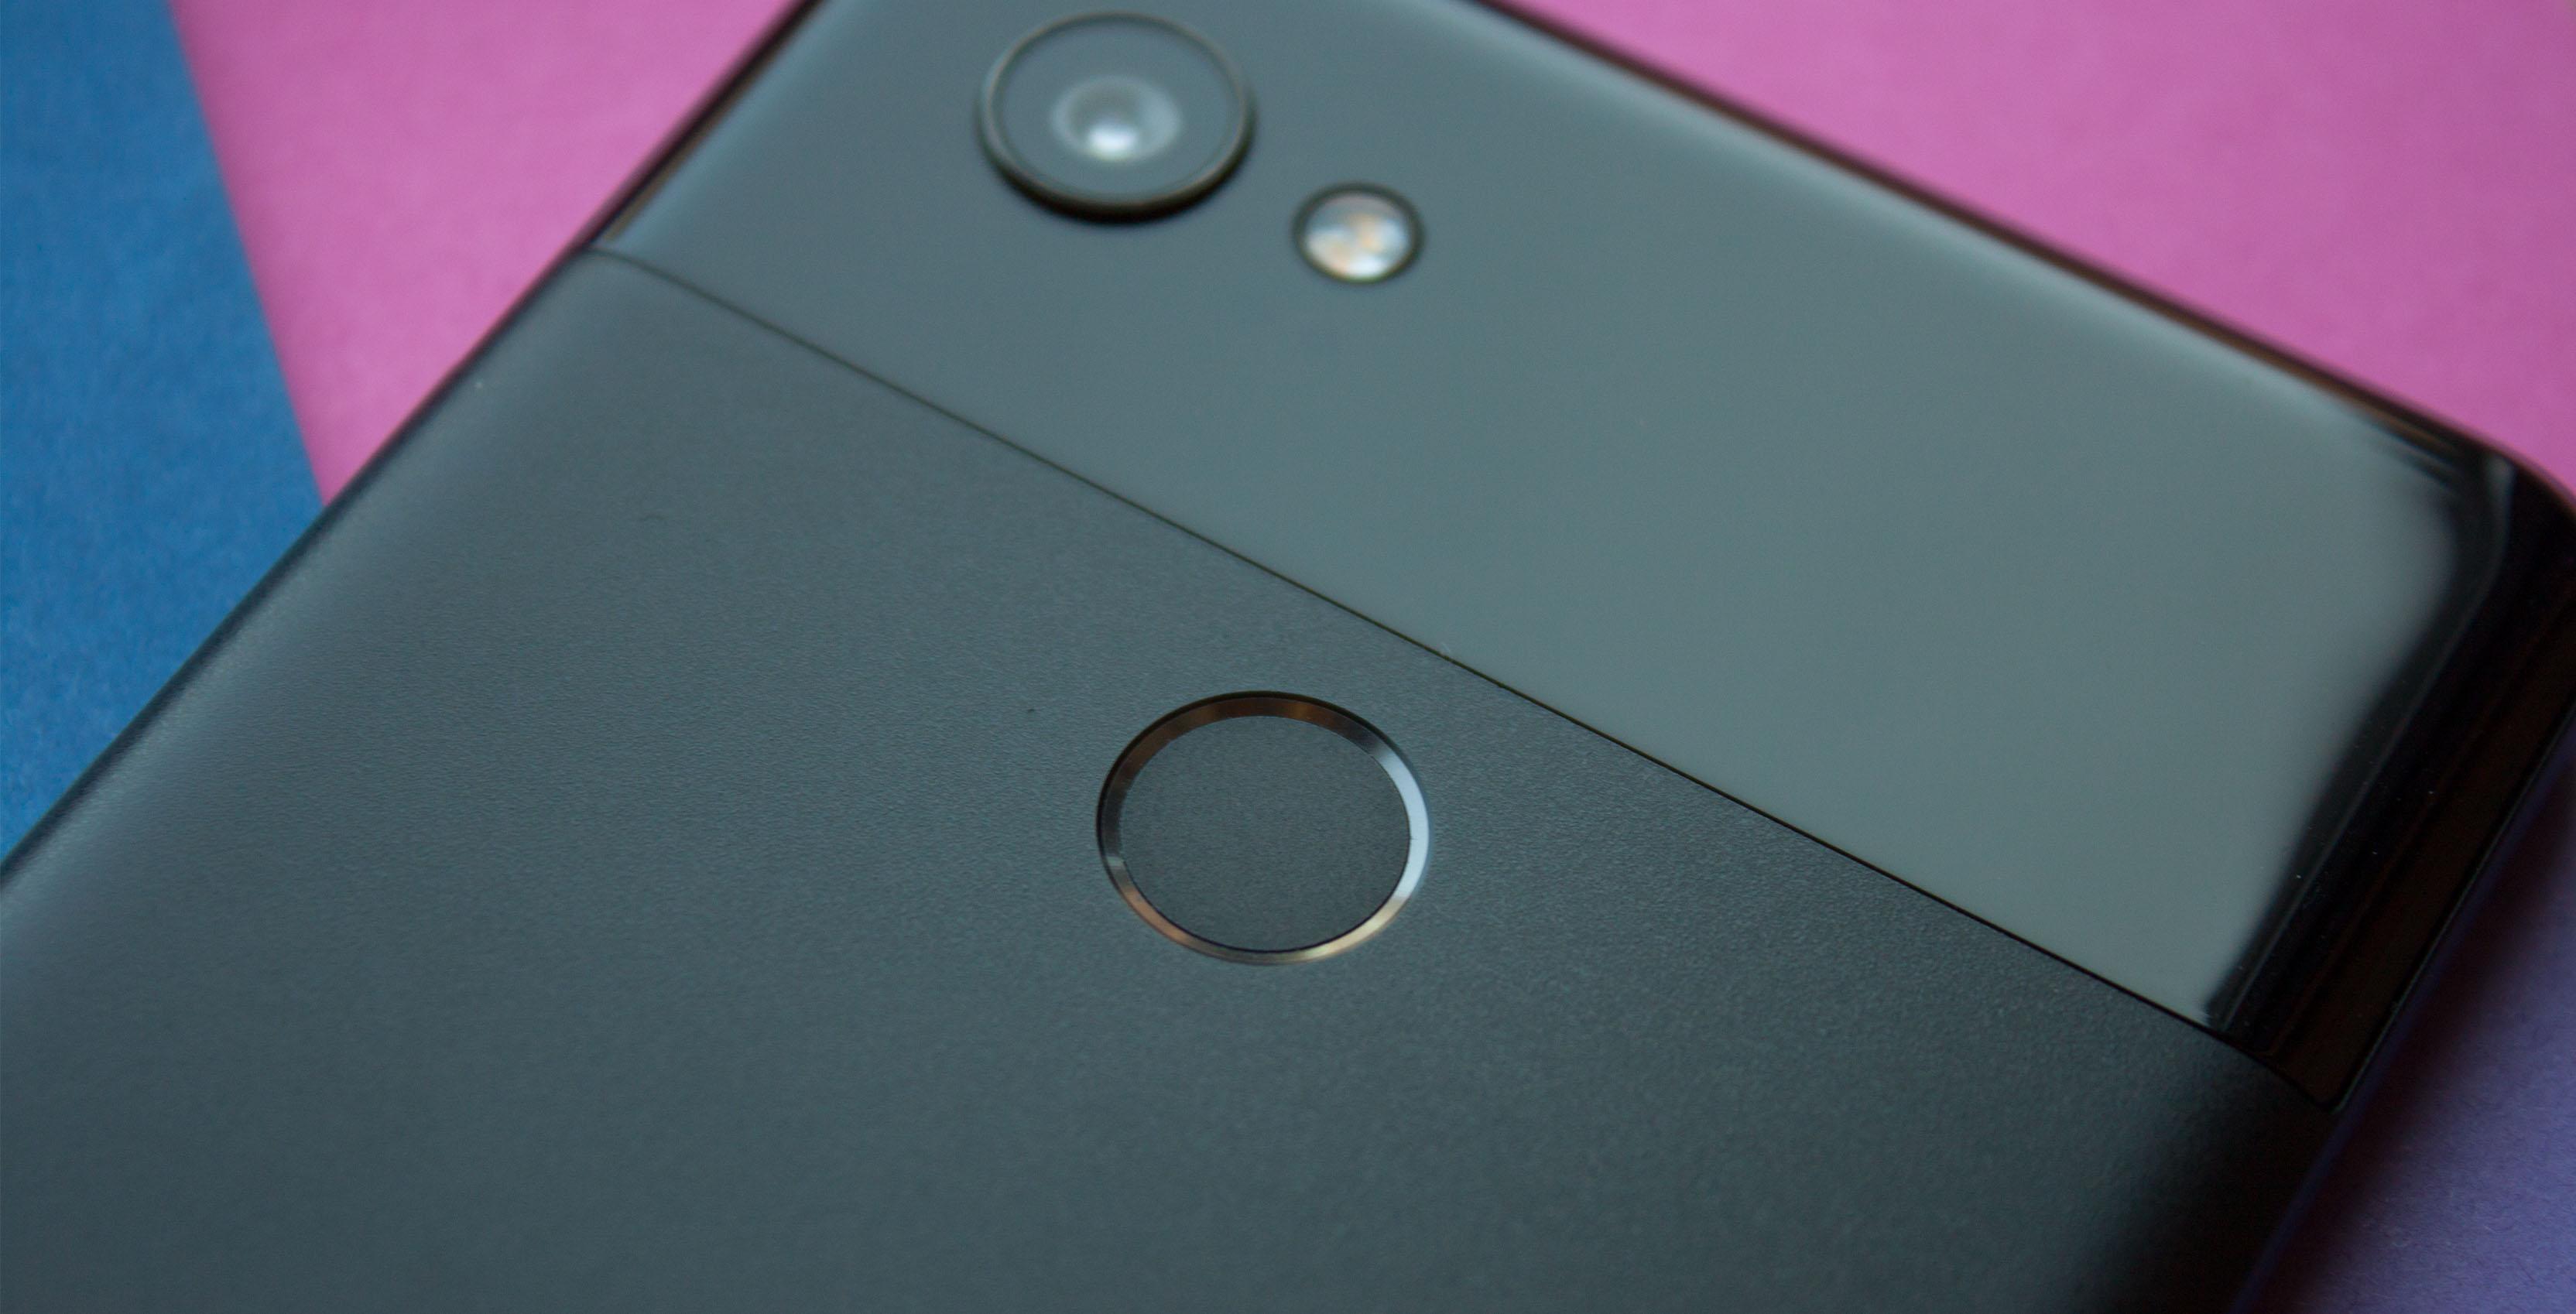 Google Pixel 2 XL fingerprint scanner